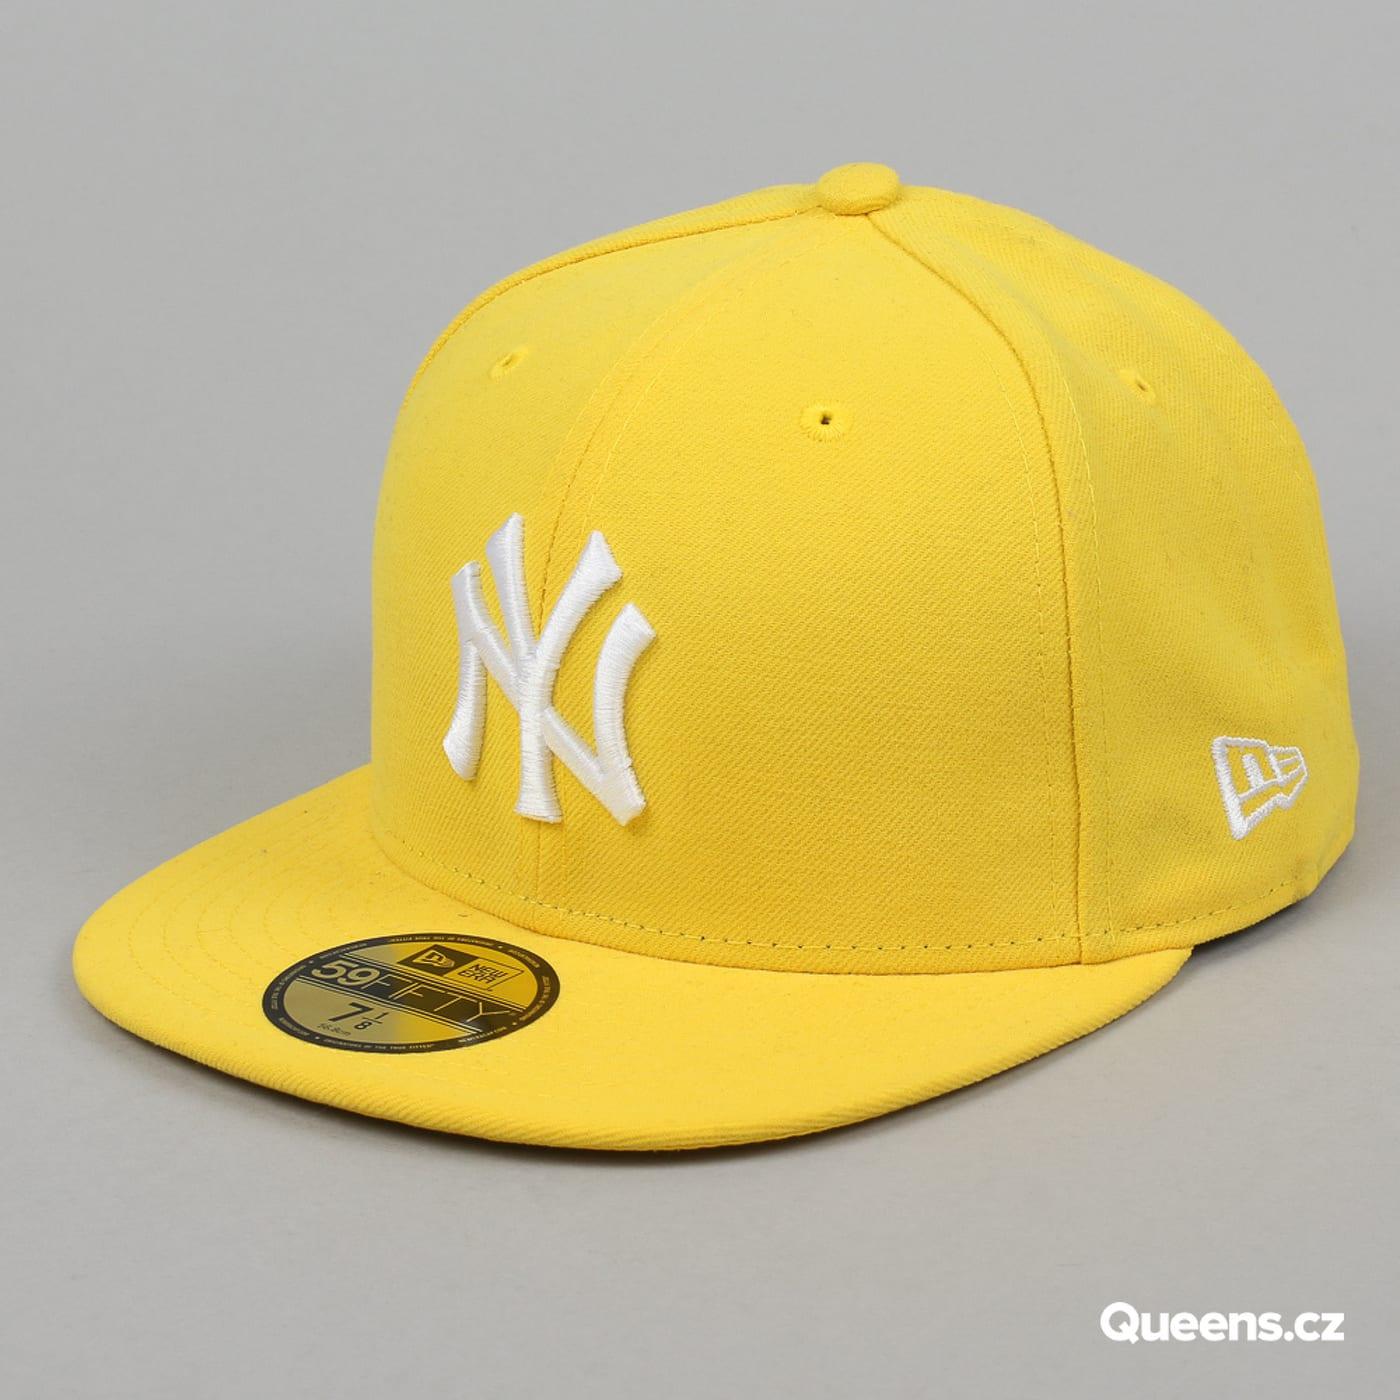 New Era MLB Basic NY yellow